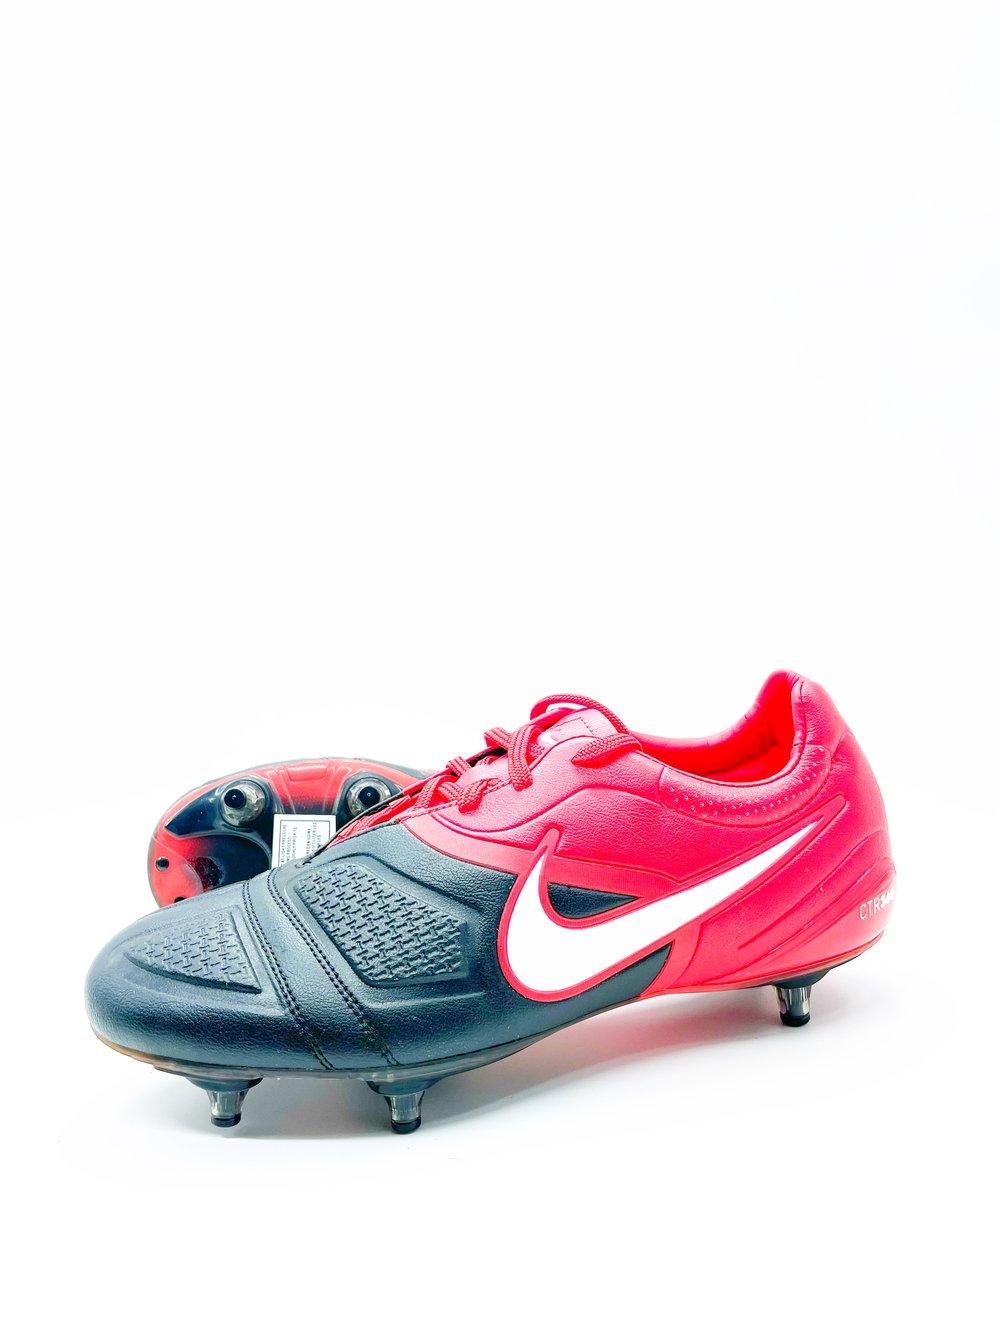 Image of Nike Ctr360 Maestri I OG